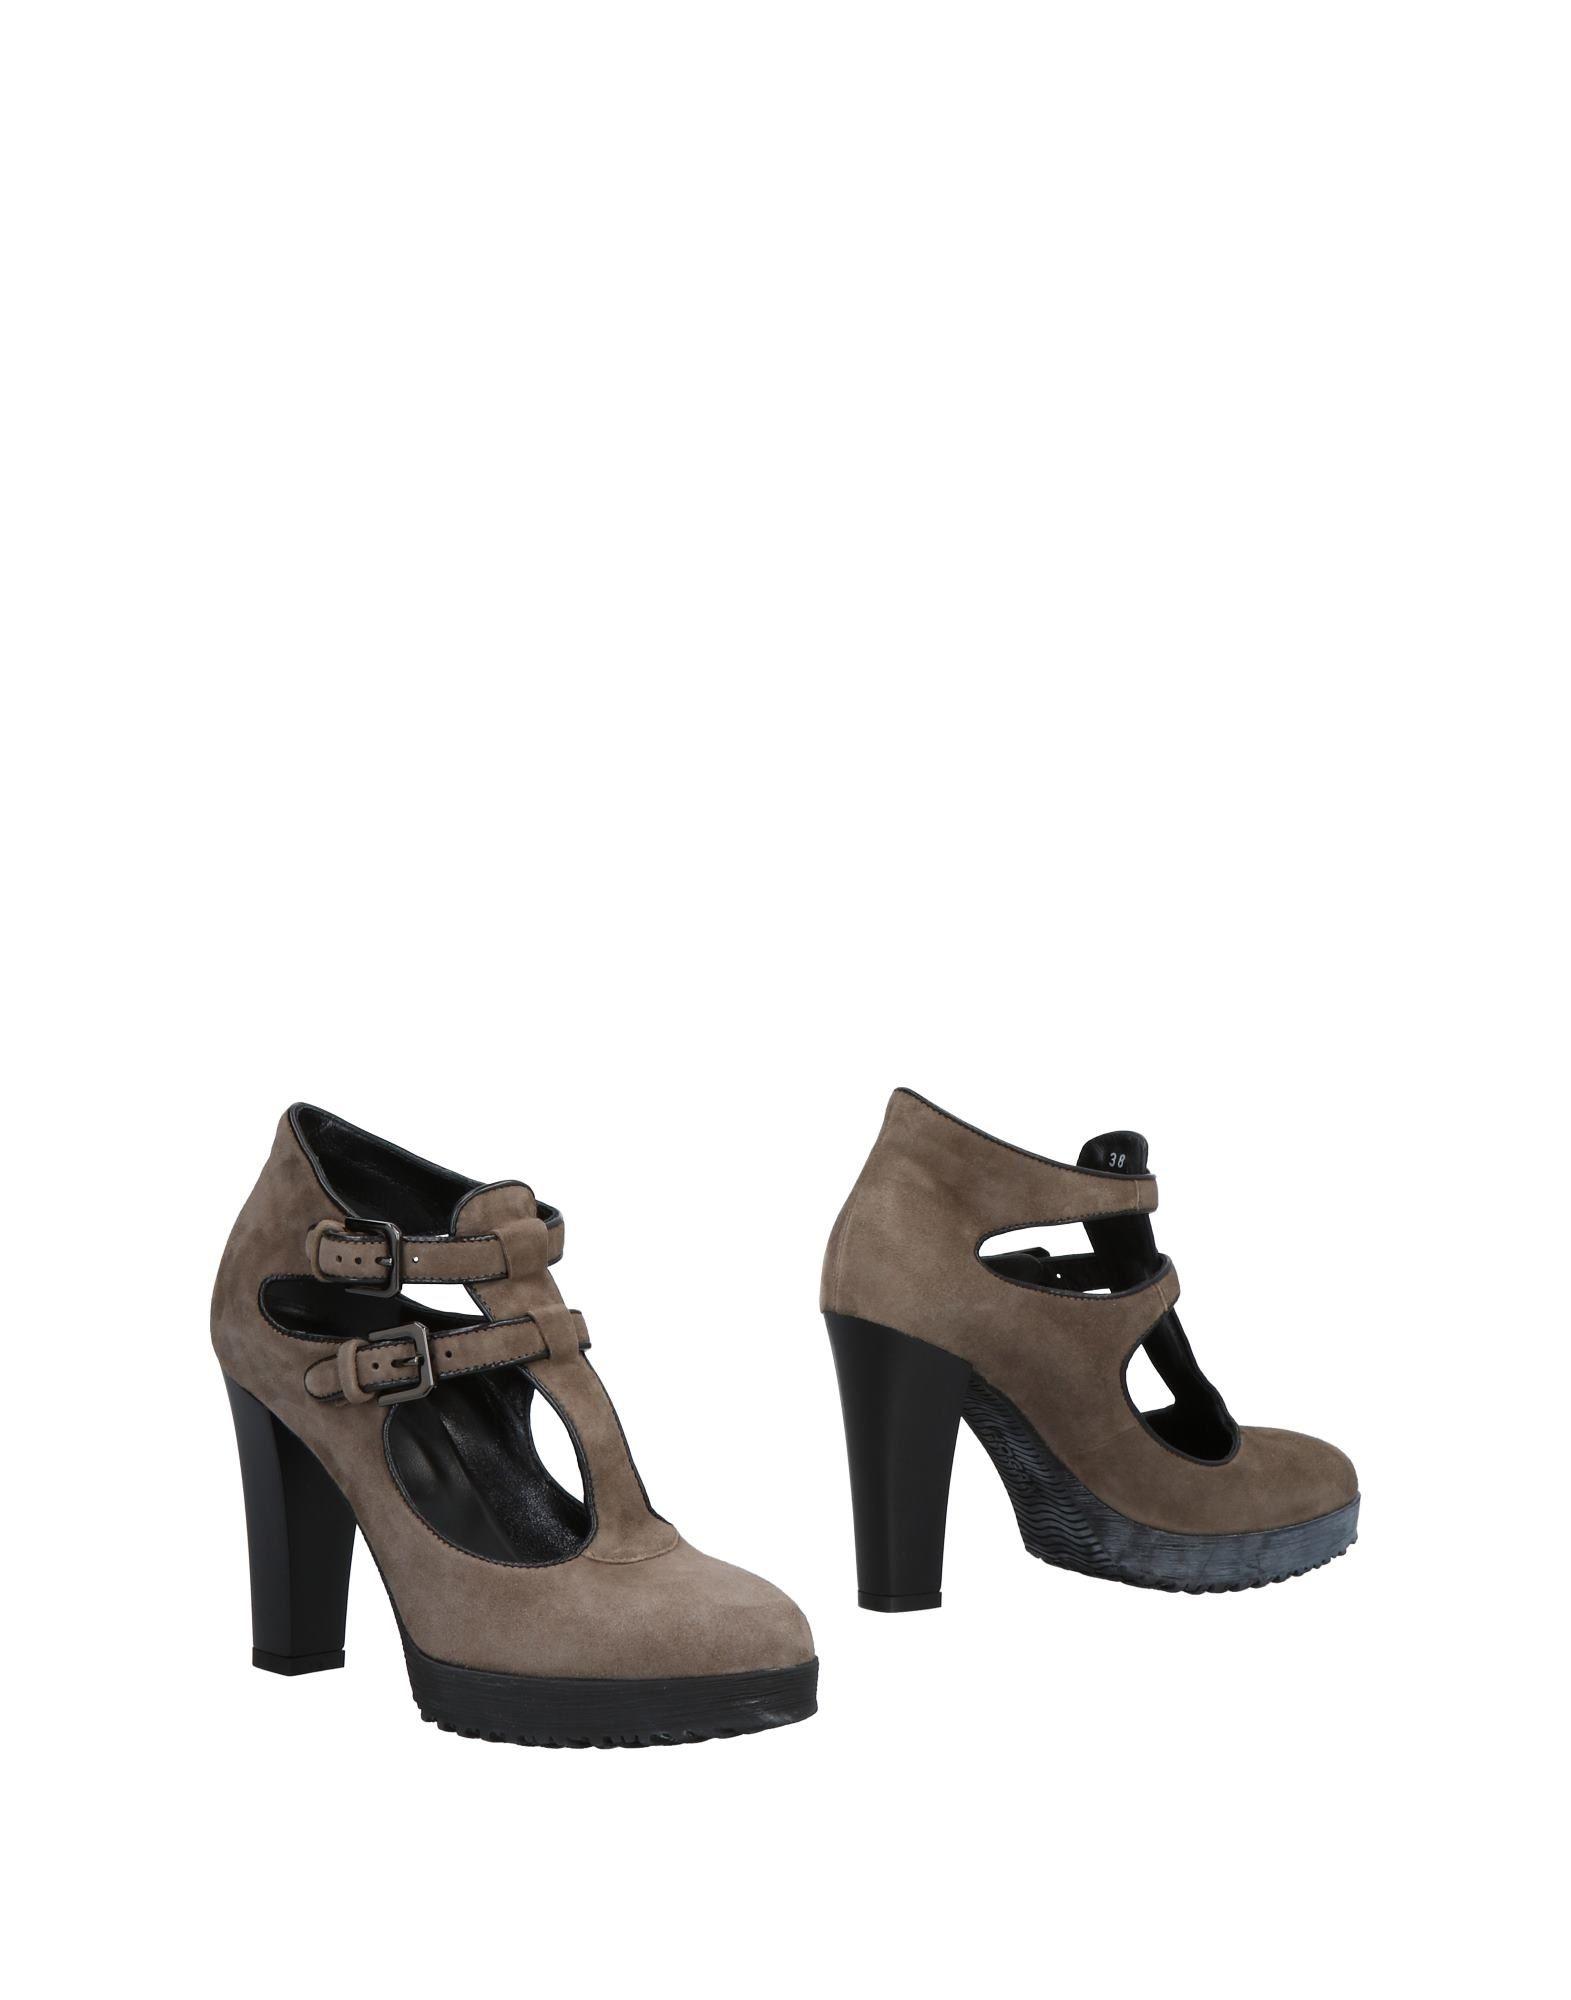 Hogan Stiefelette Damen  11232334RJGut strapazierfähige aussehende strapazierfähige 11232334RJGut Schuhe 39e9cd